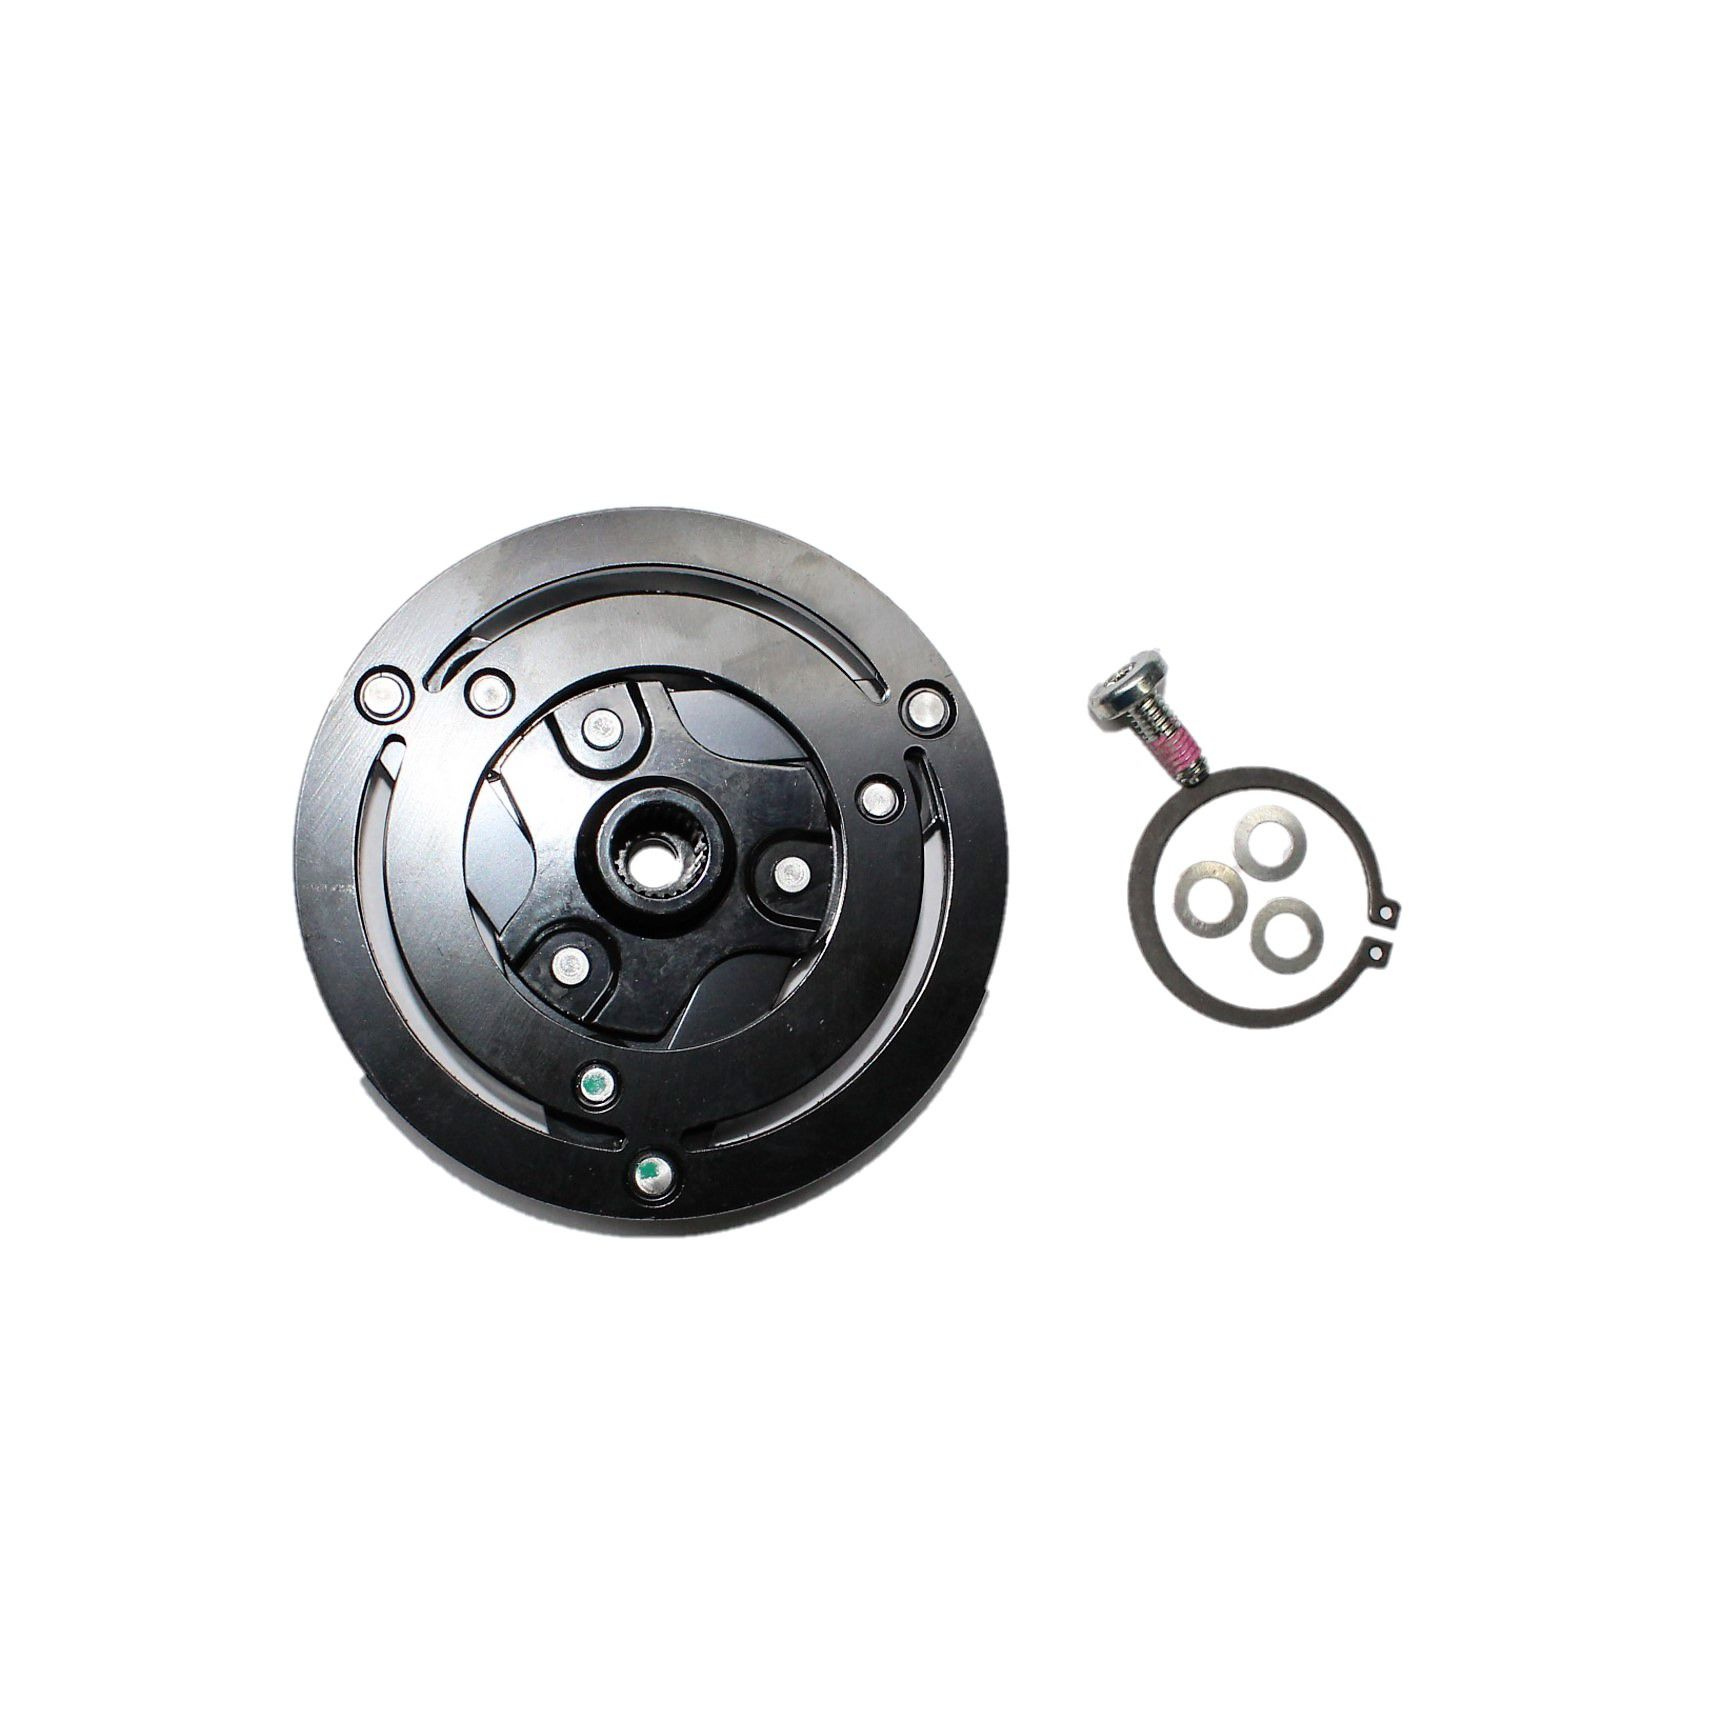 Embreagem Compressor Mahle Jeep Renegade, Compass, Fiat Toro